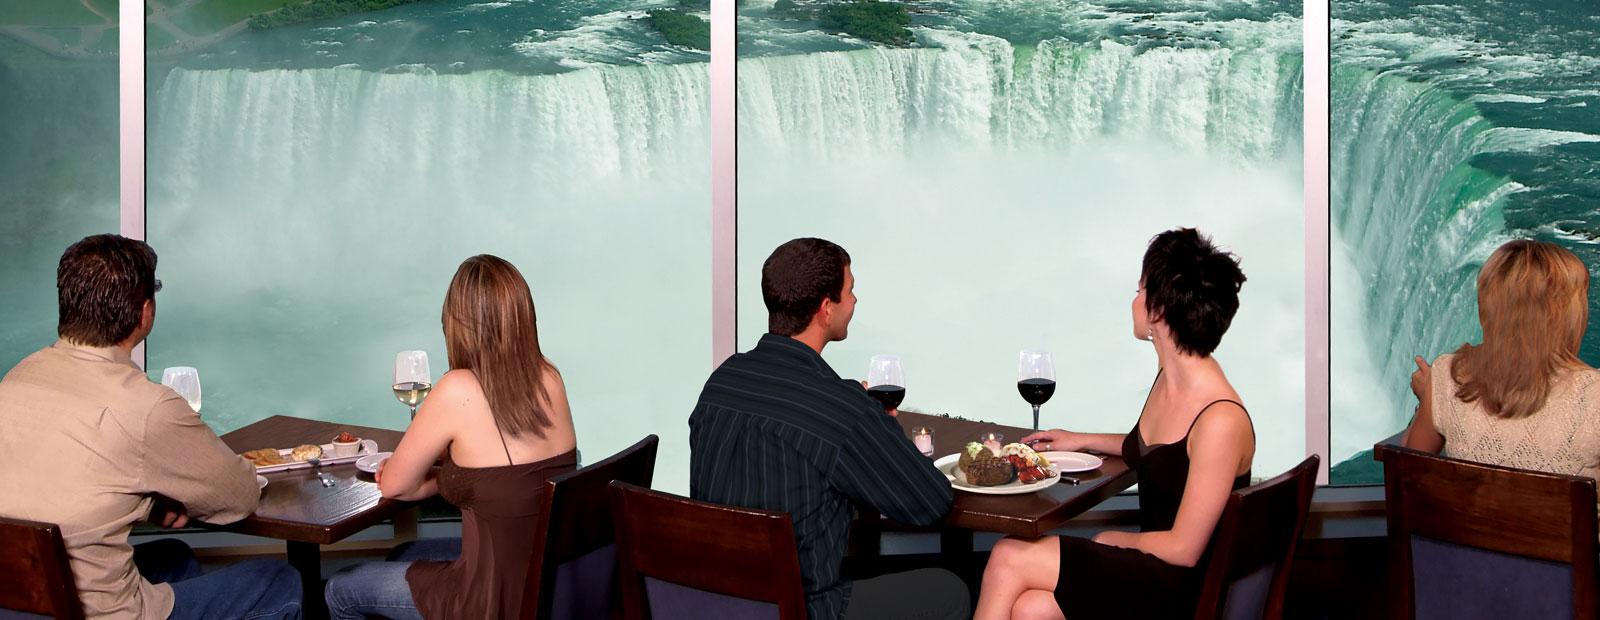 Niagara Falls Emby Suites Fallsview Hotel Hotels